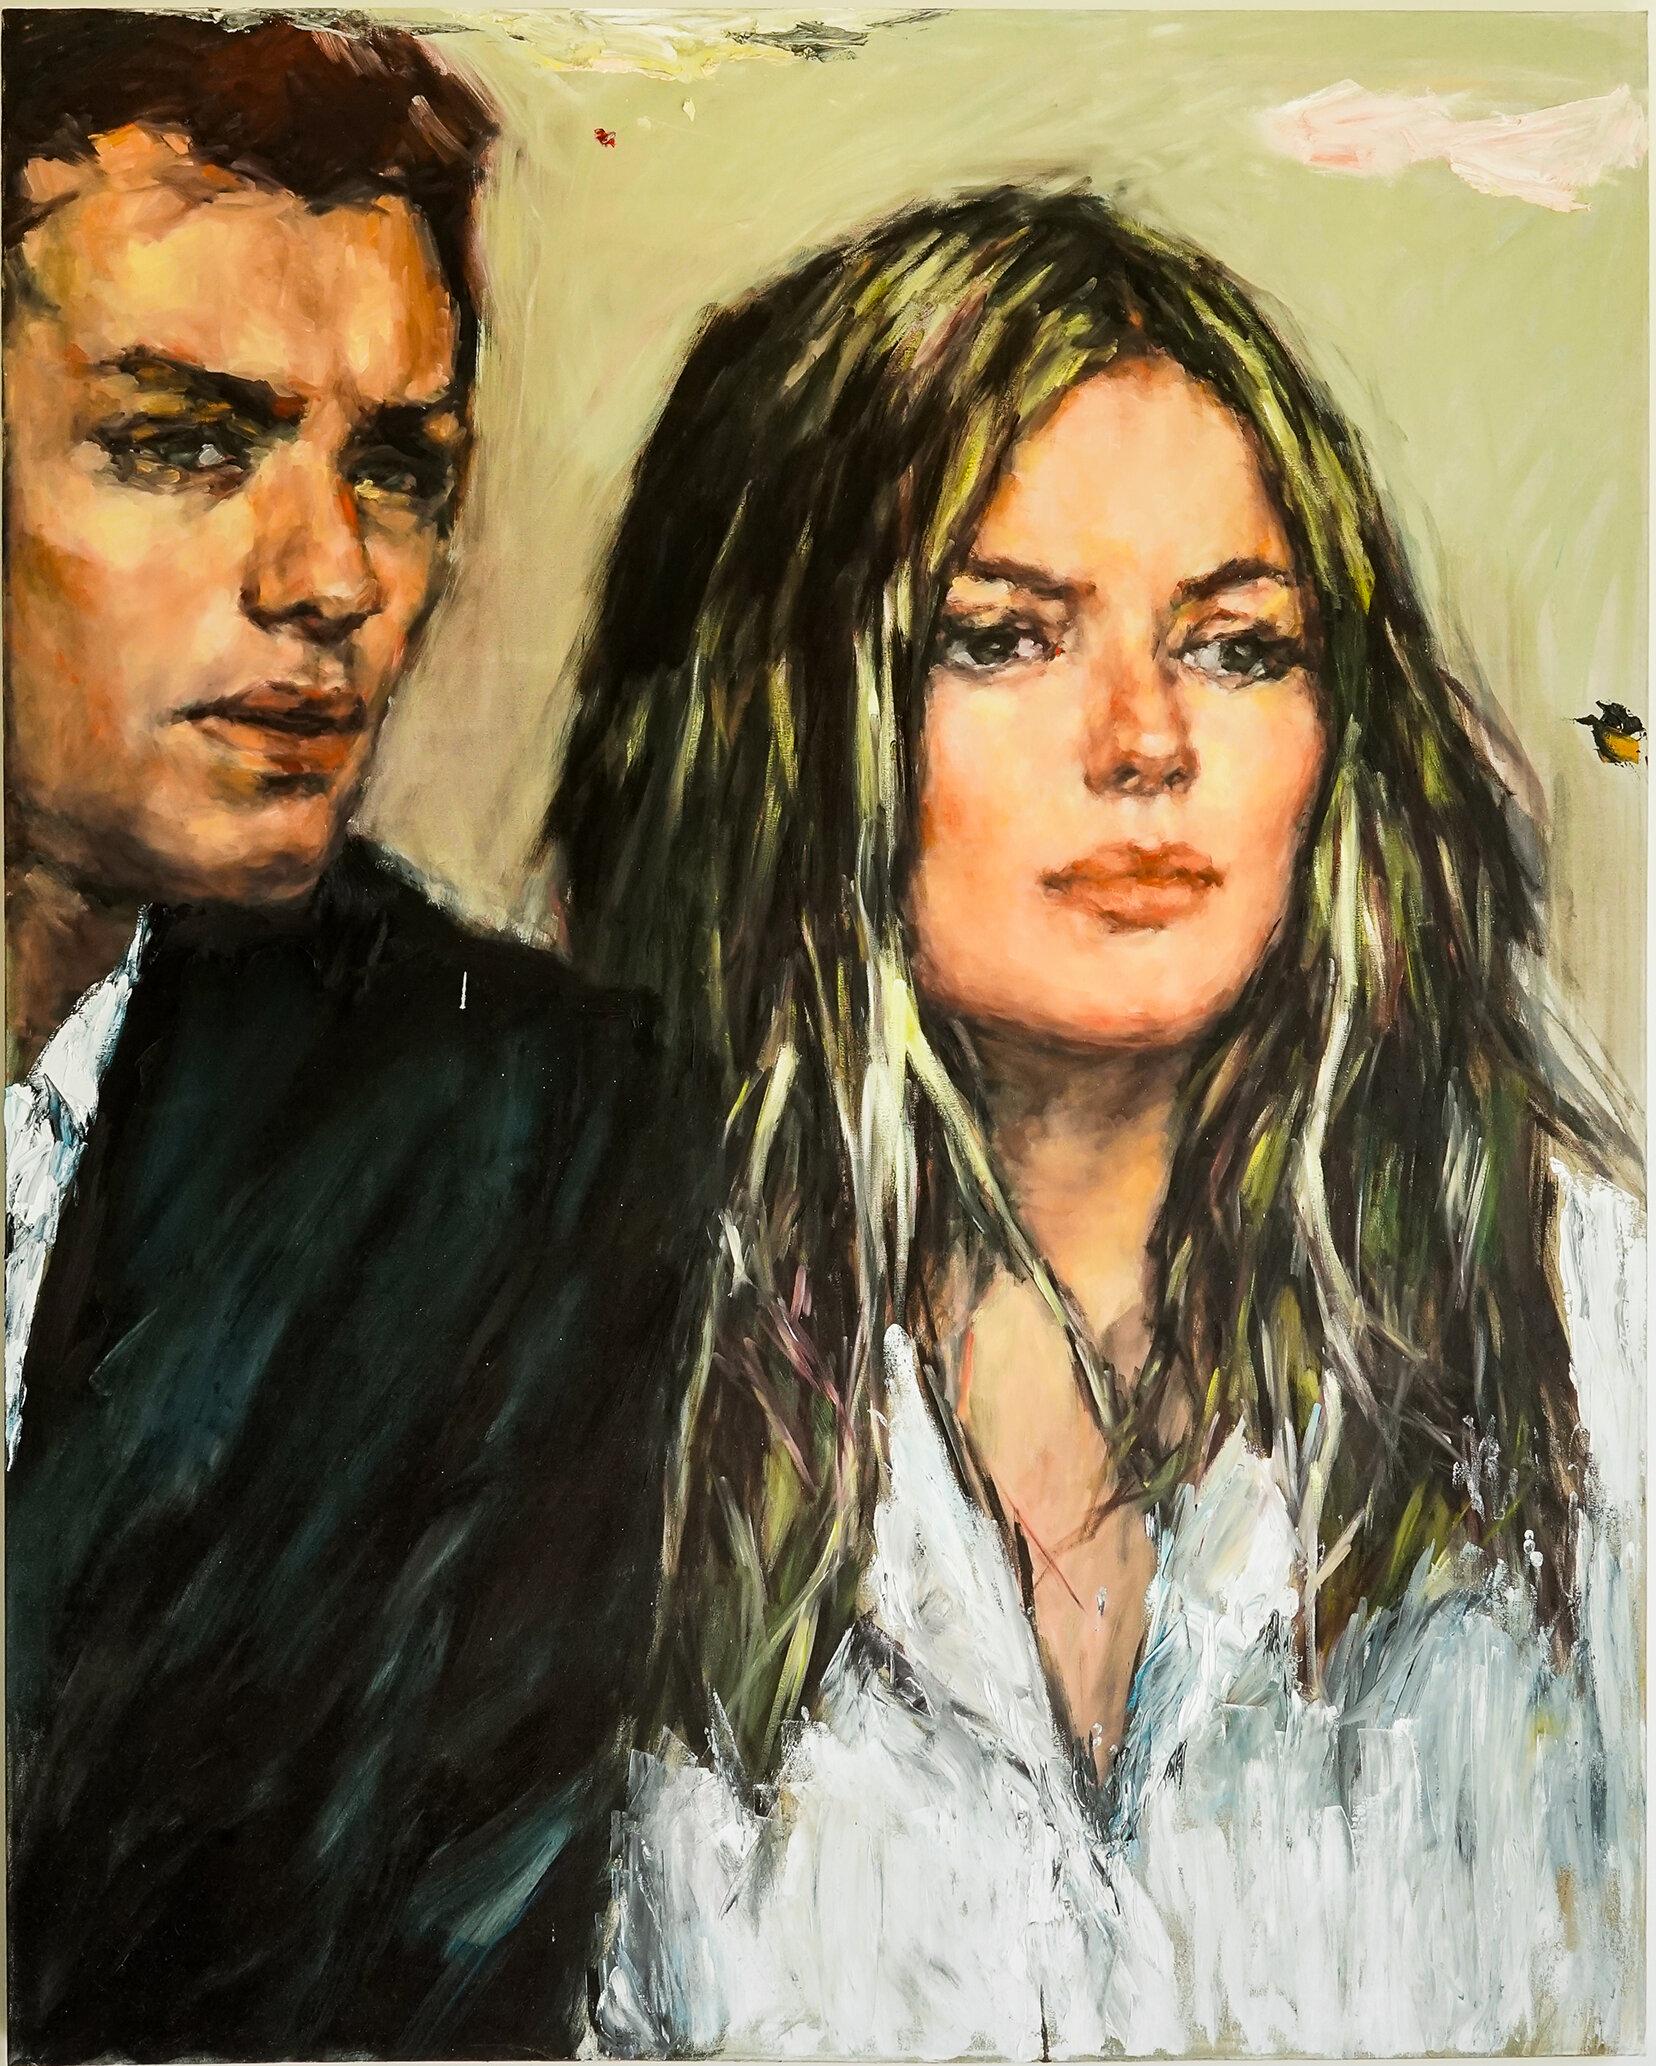 Couple A - 60 x 48, Oil and Acrylic on Canvas